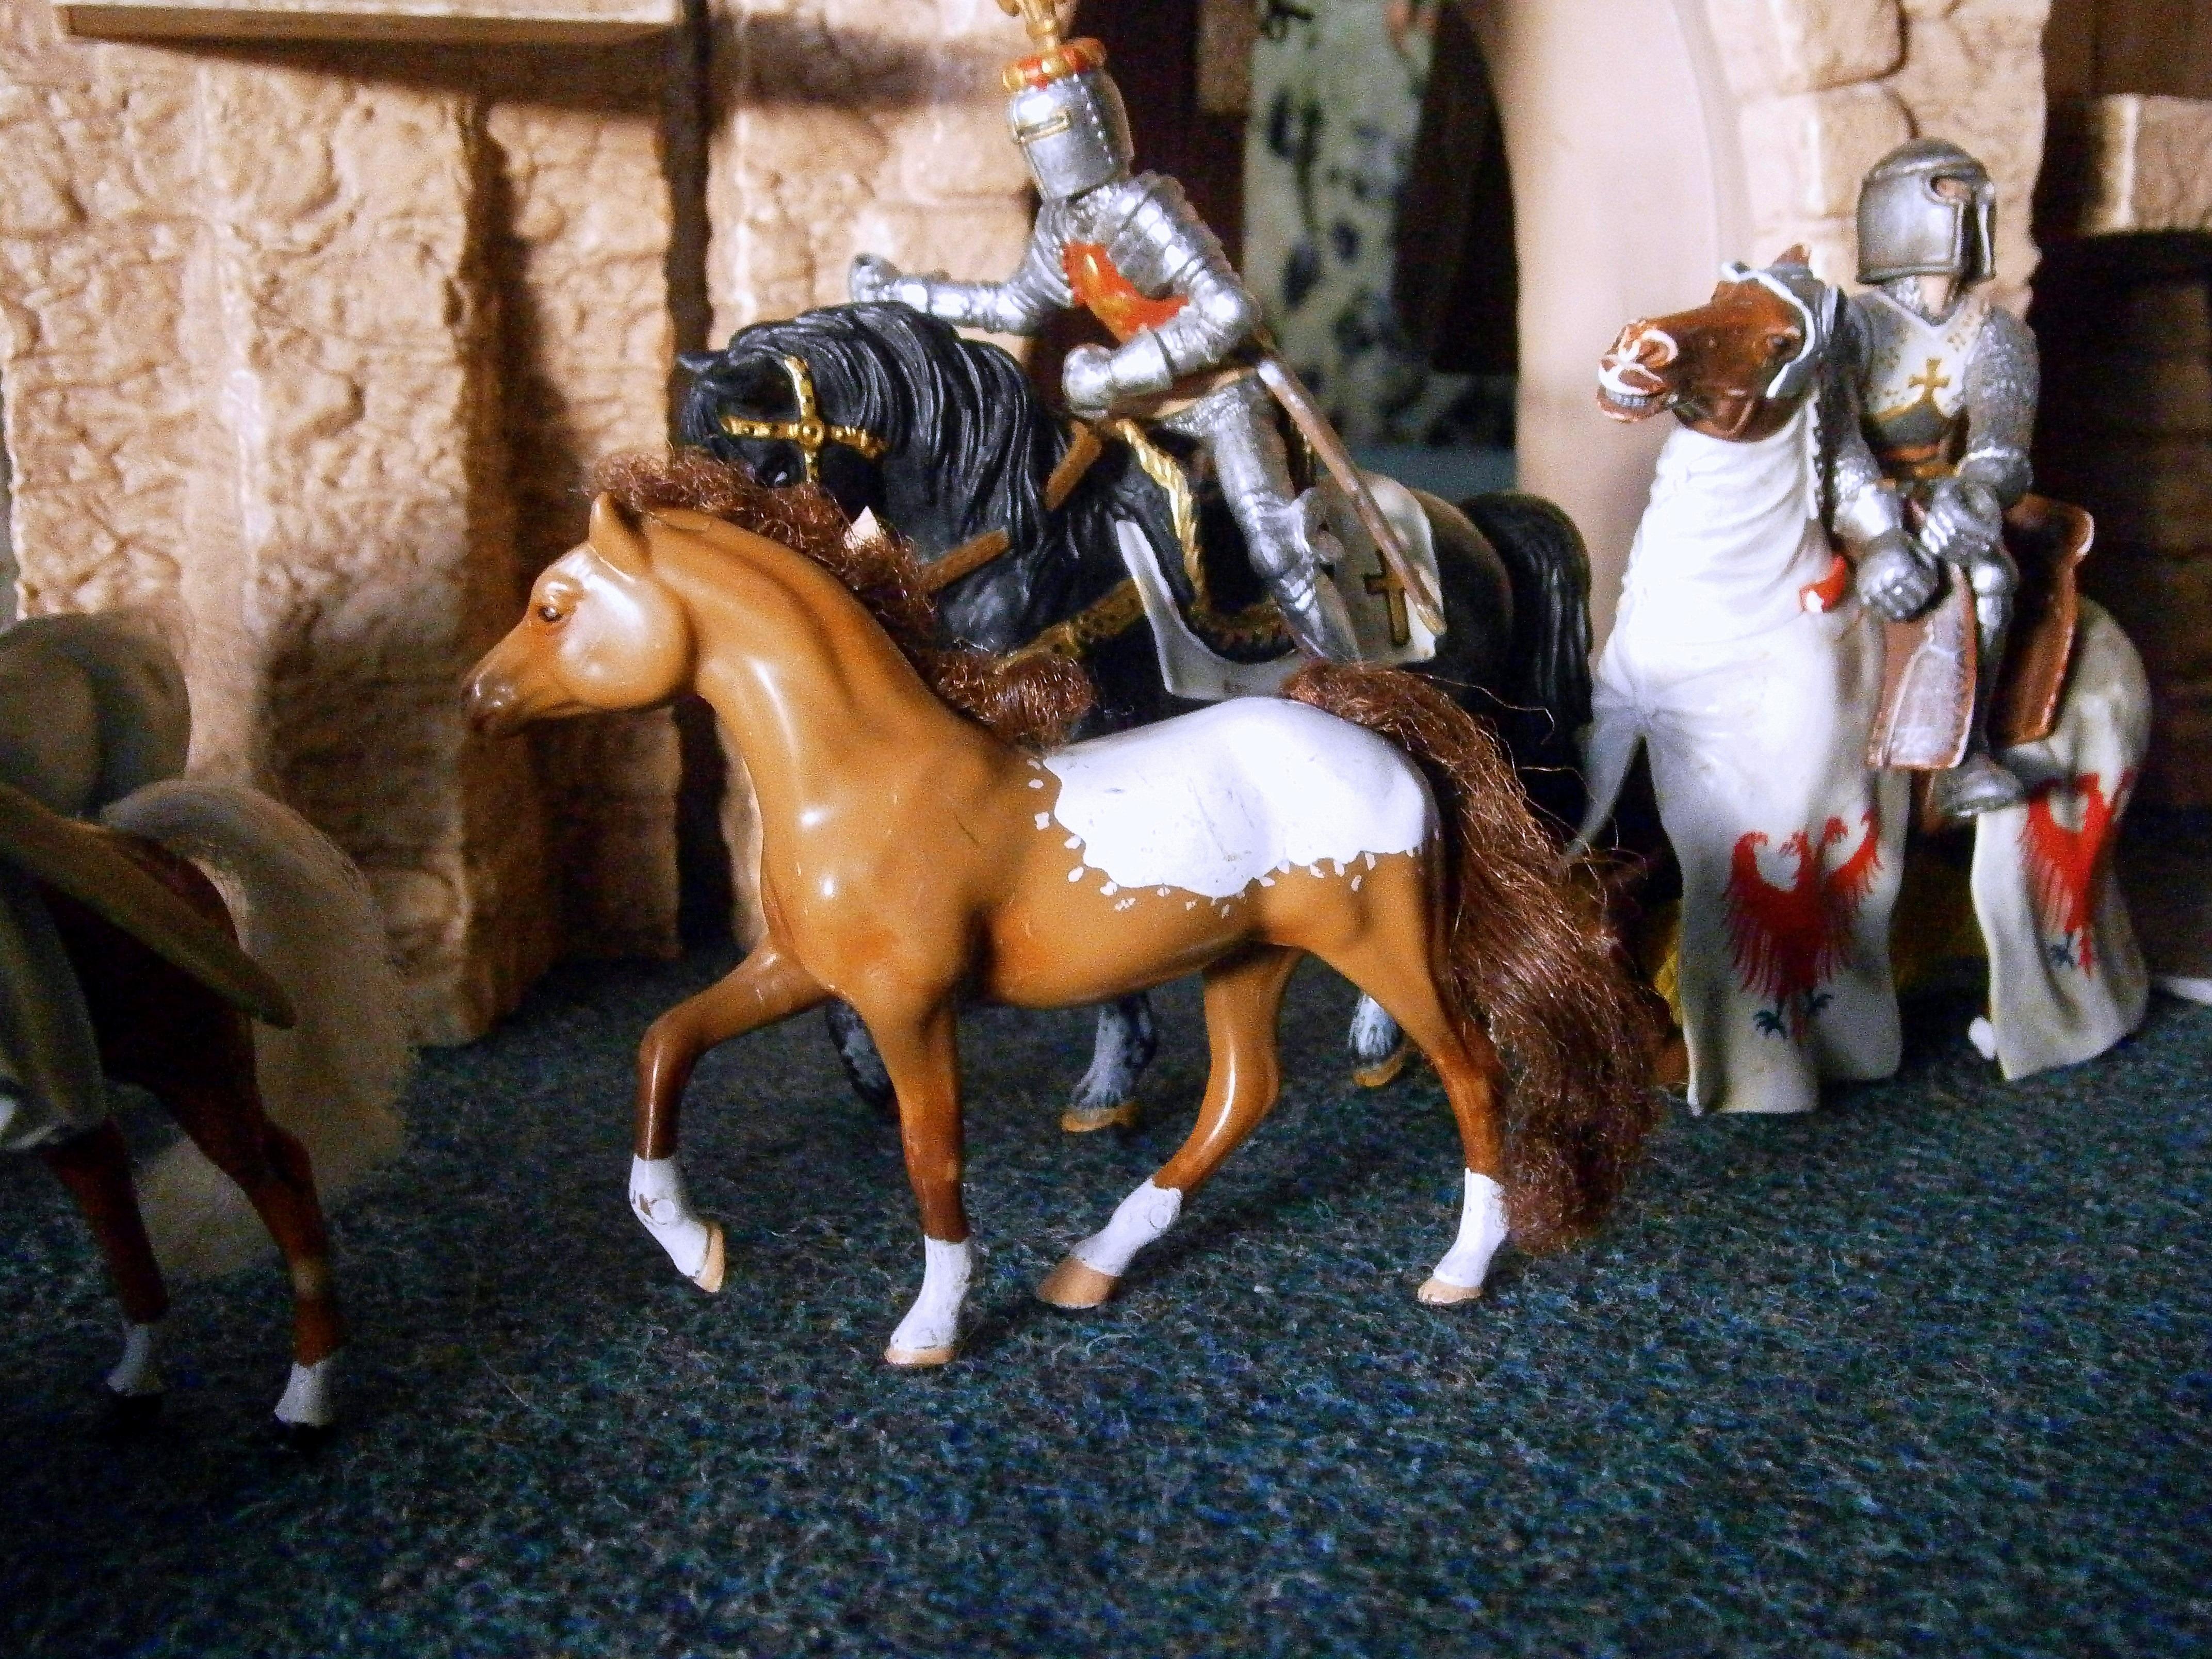 fotos gratis jugar caballo castillo nio arreglo lucha nios juguetes jardn de infancia construir escena edades medias combinar regulacin